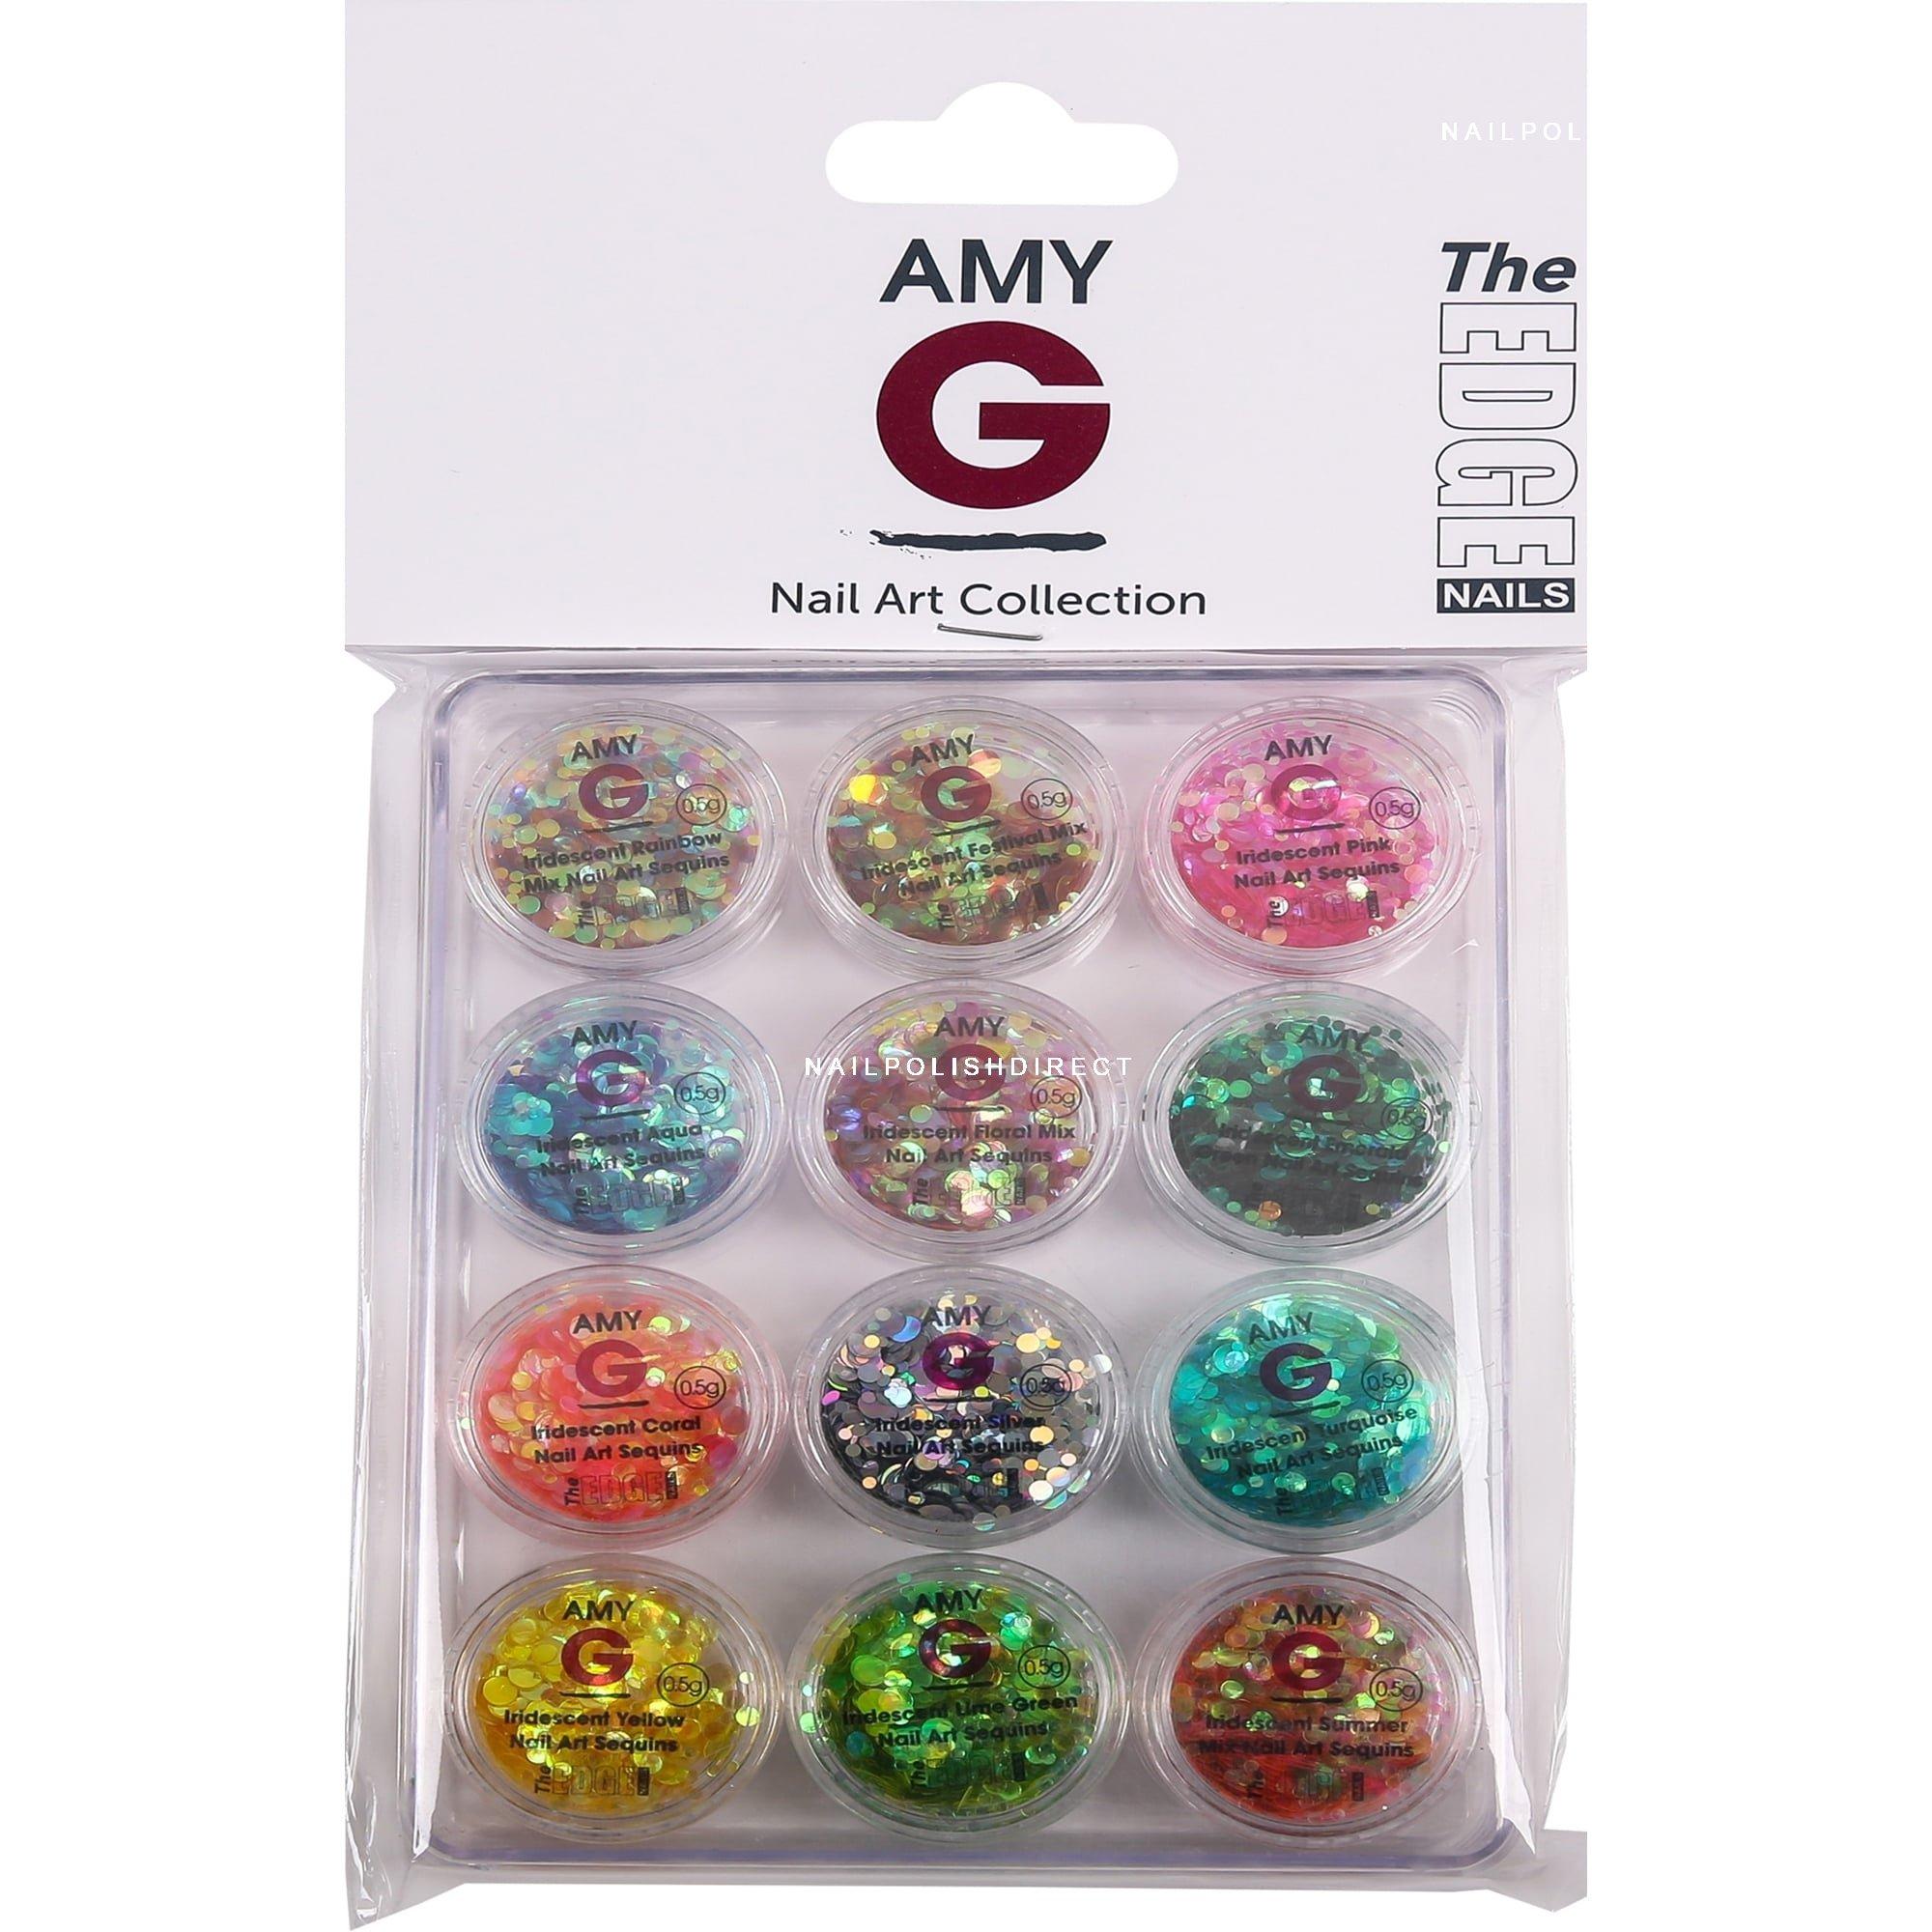 Amy G - Iridescent Nail Art Sequins - Iridescent Kit (12 X 0 5g) (3003081)